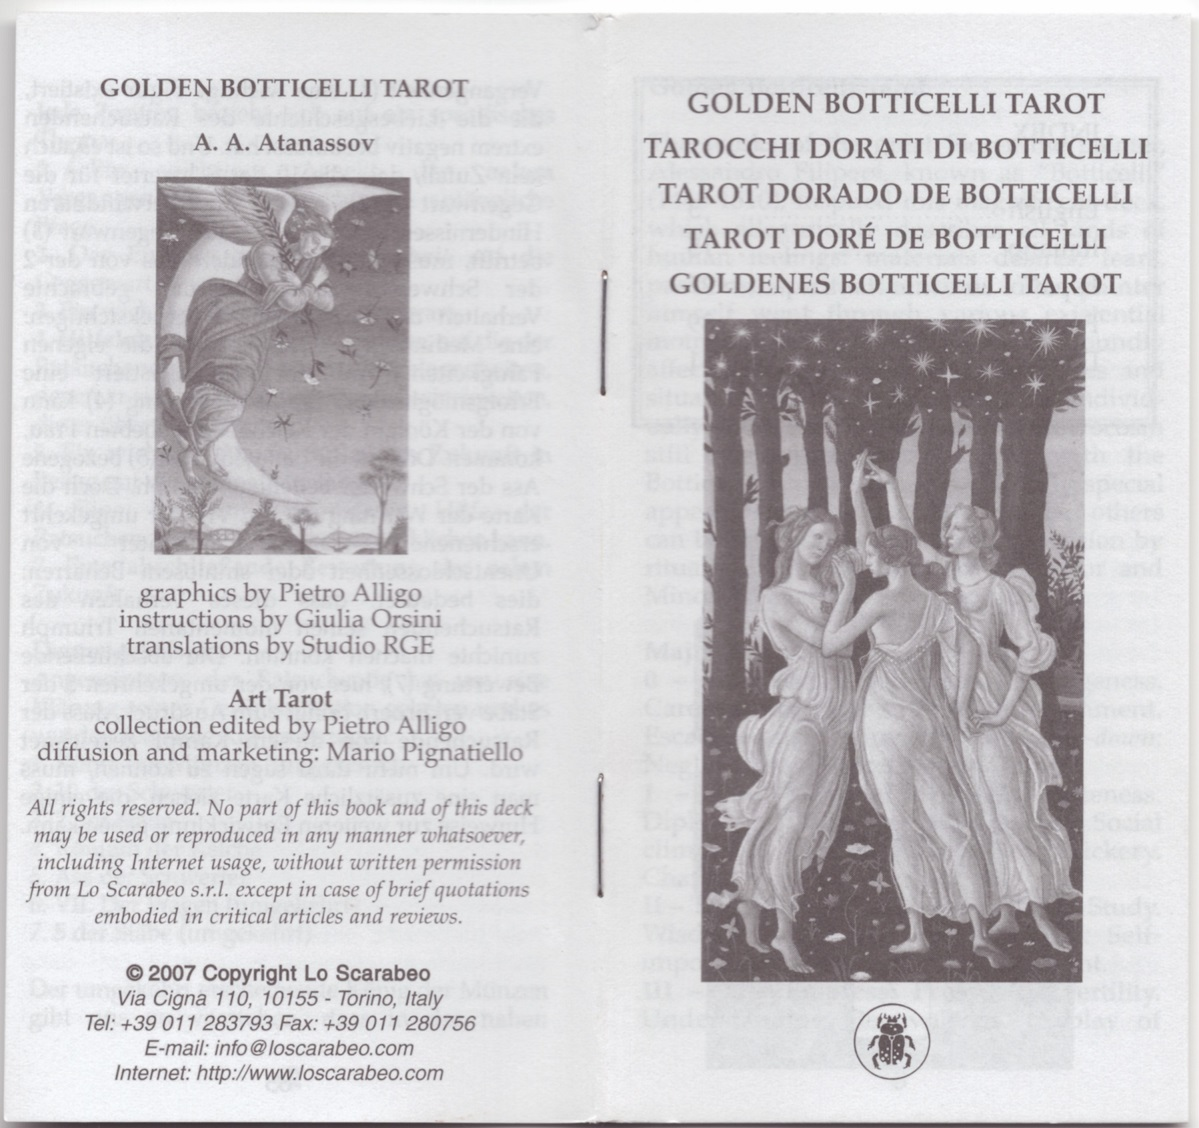 GoldenBotticelli_LWB.jpg